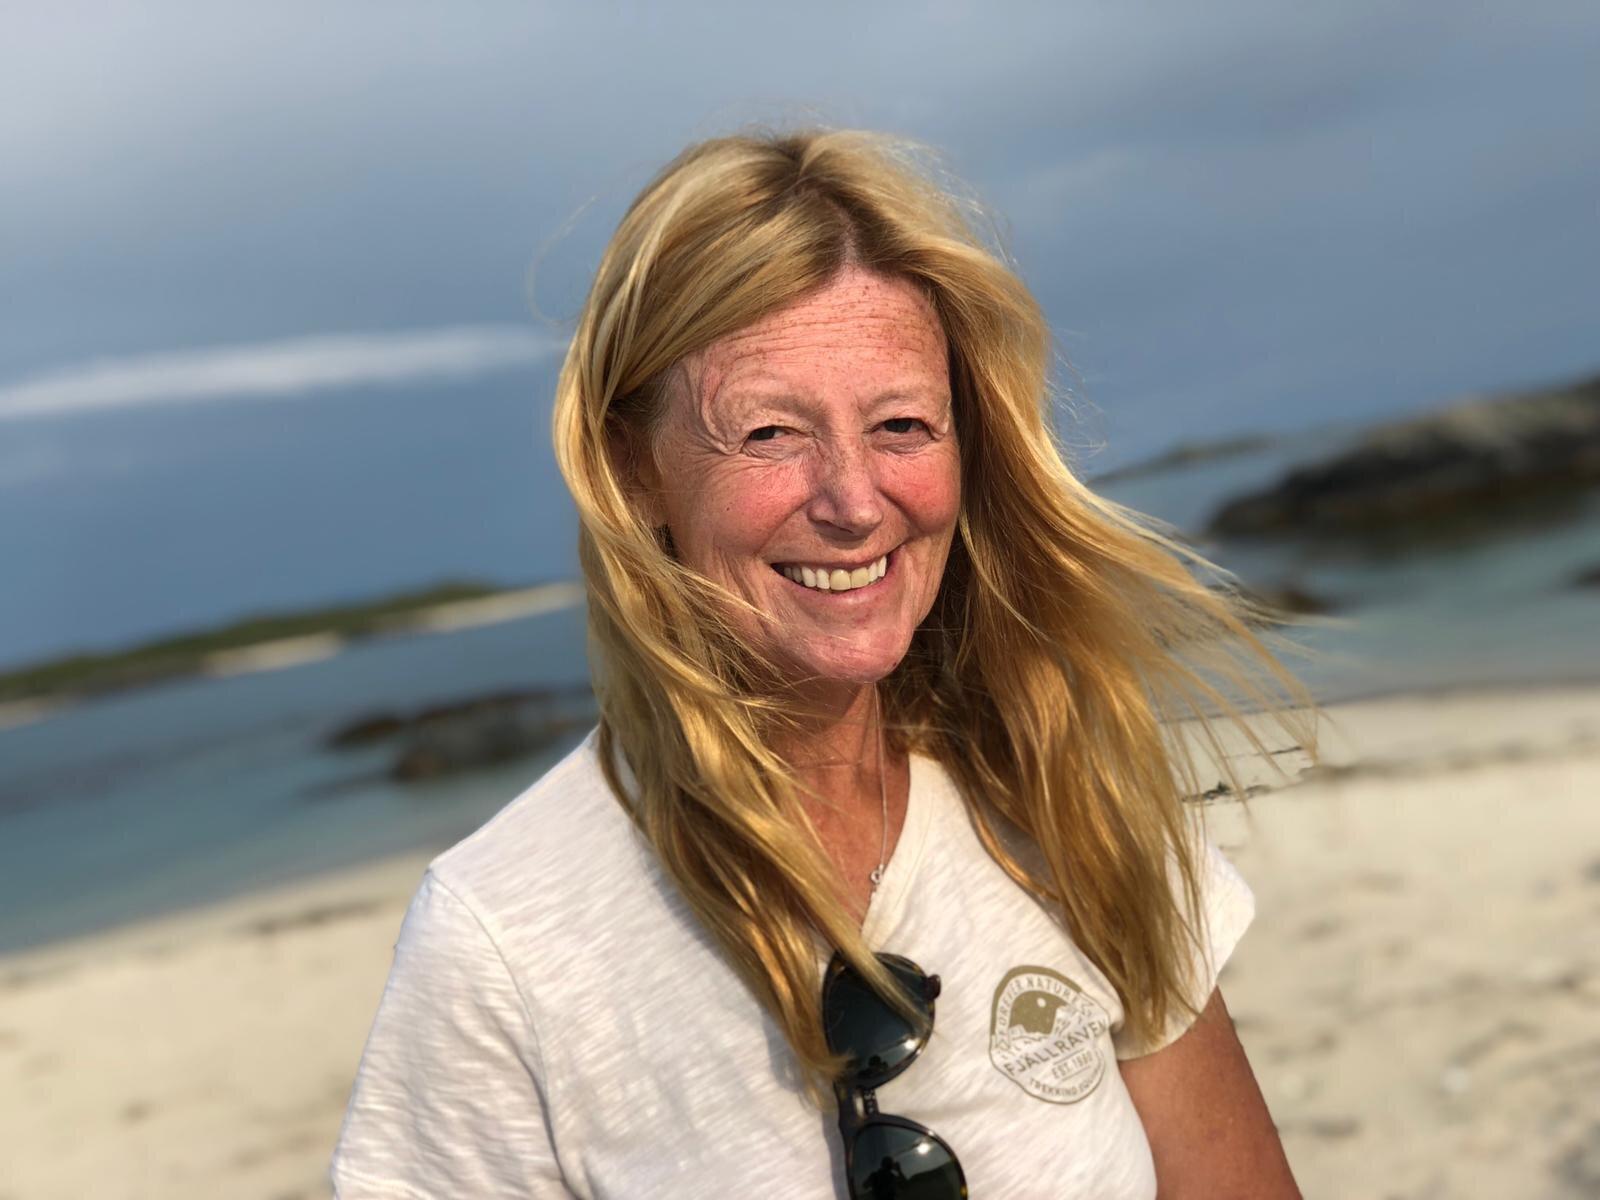 Karen Steeple - Founder of Greengairs Health & Fitness